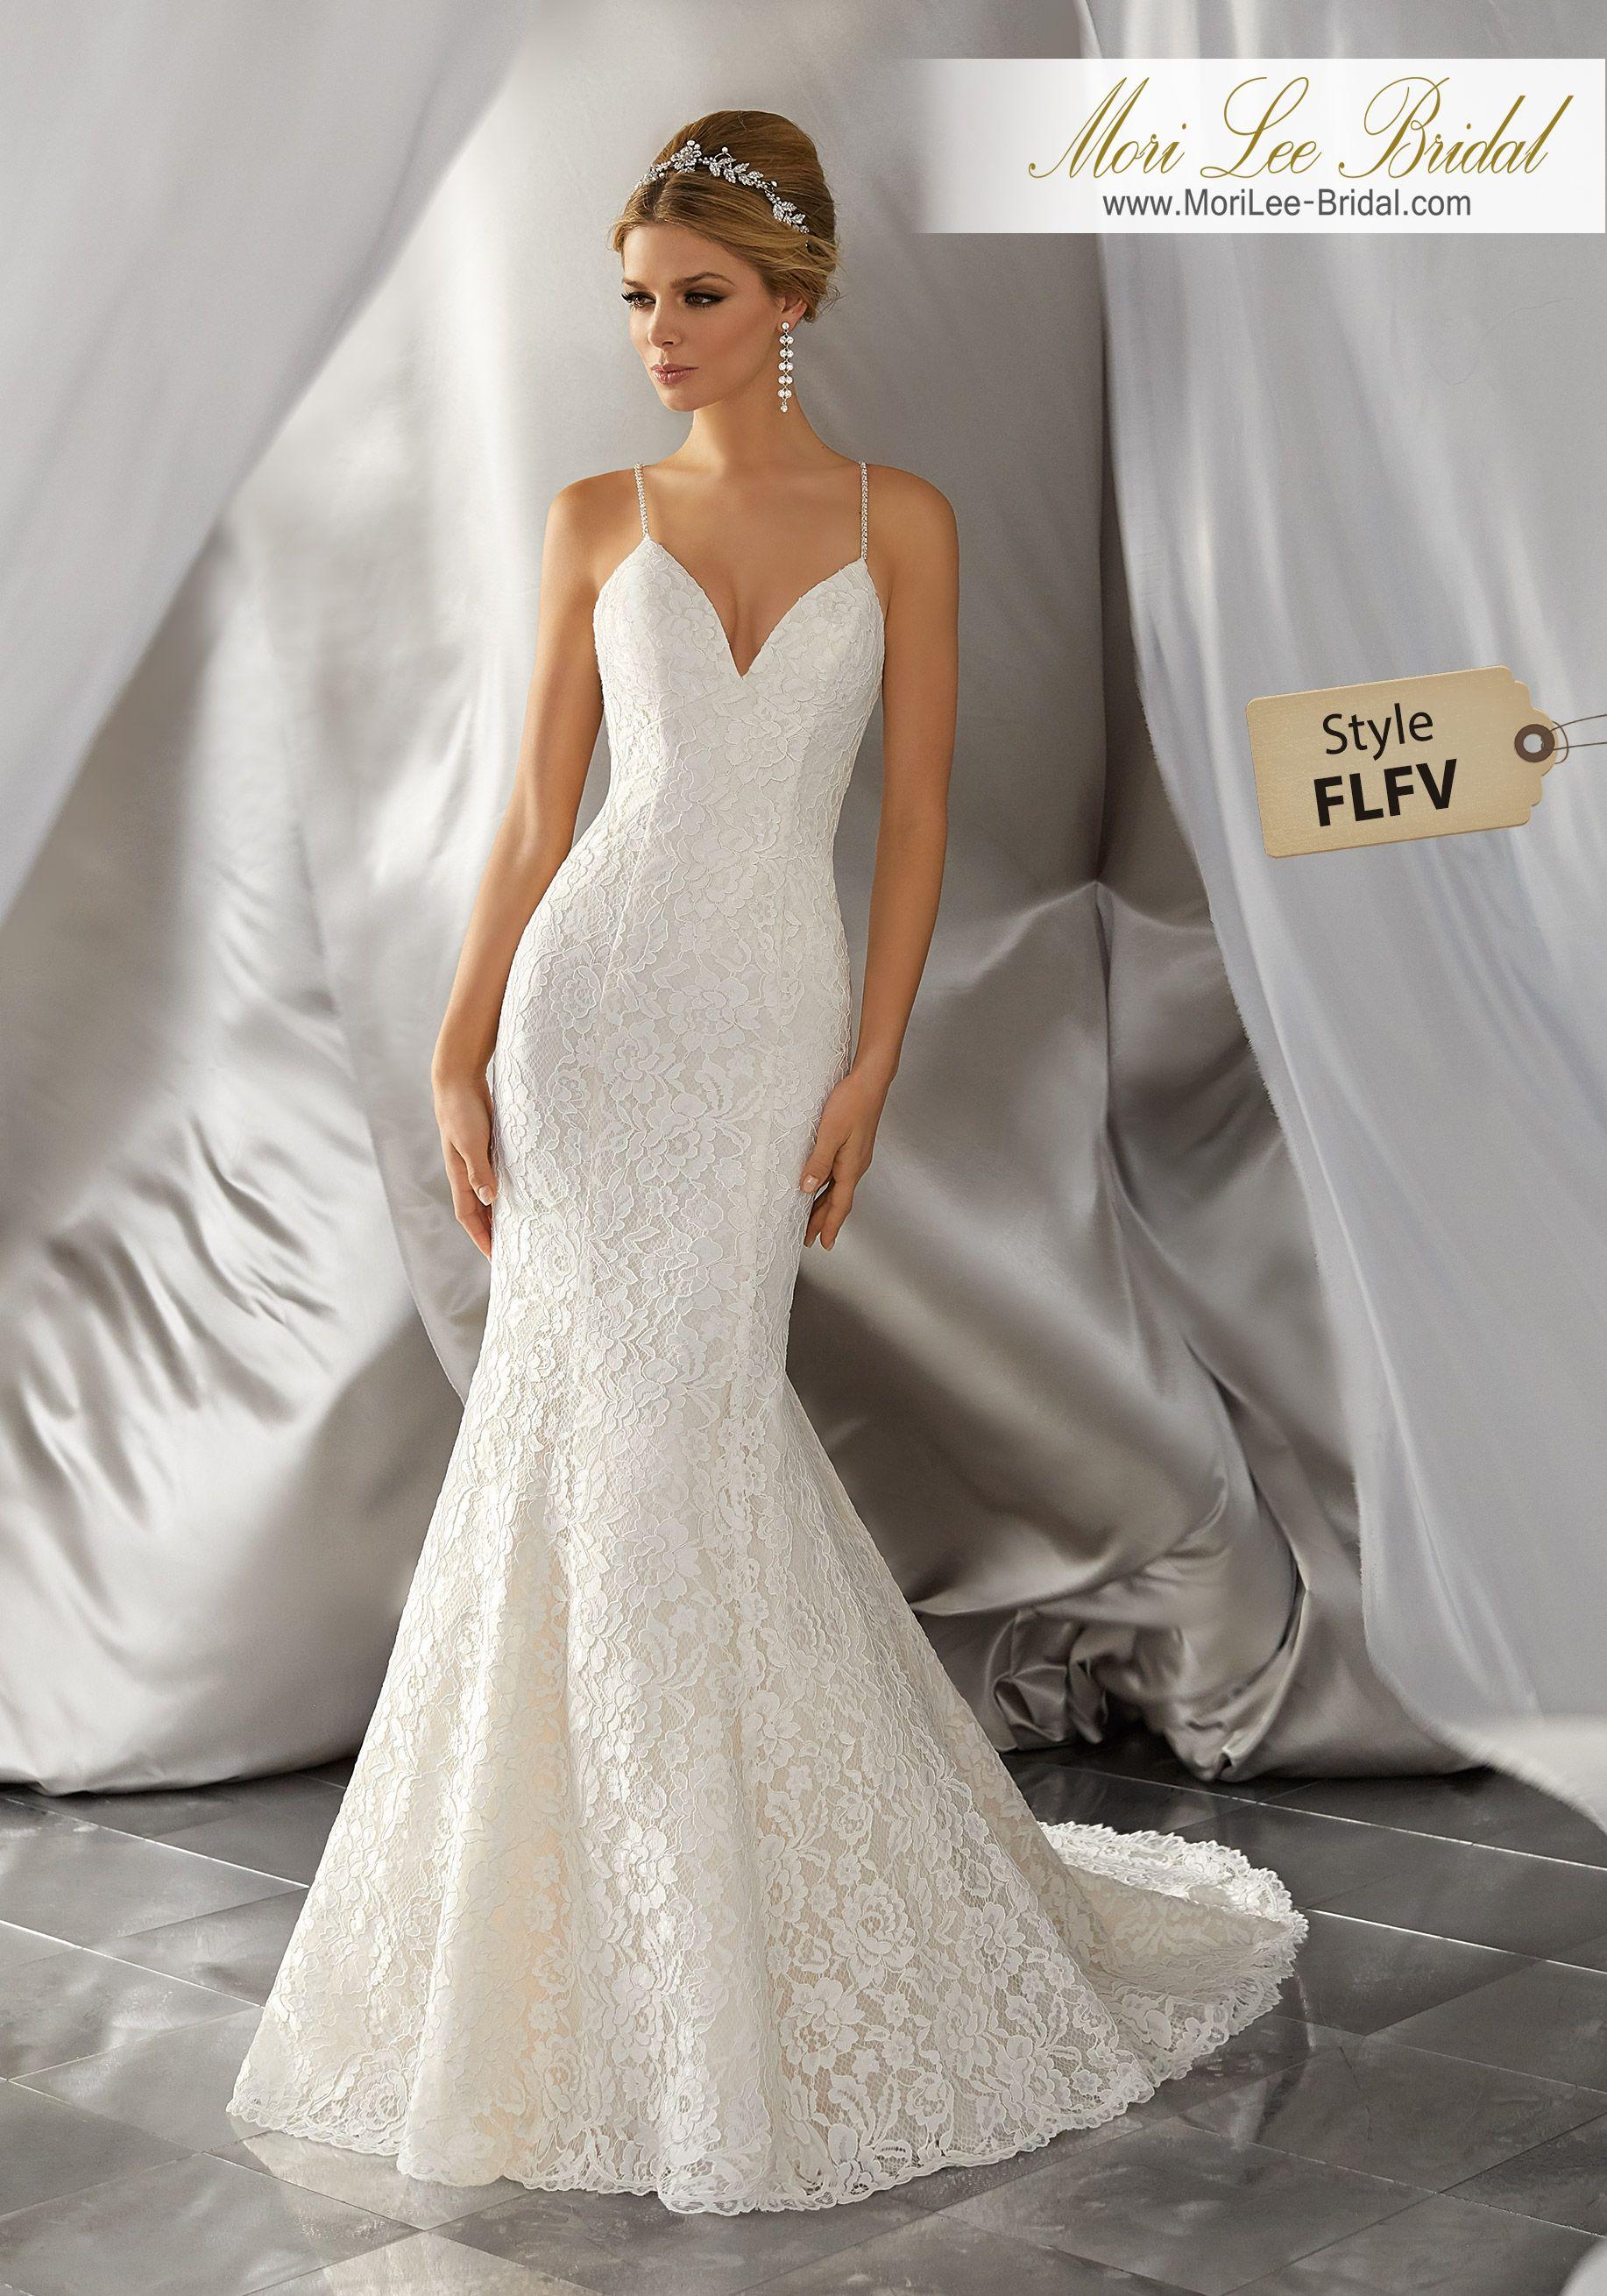 Mori Lee Wedding Dress. Find Mori Lee and More at Aria Bridal in San ...